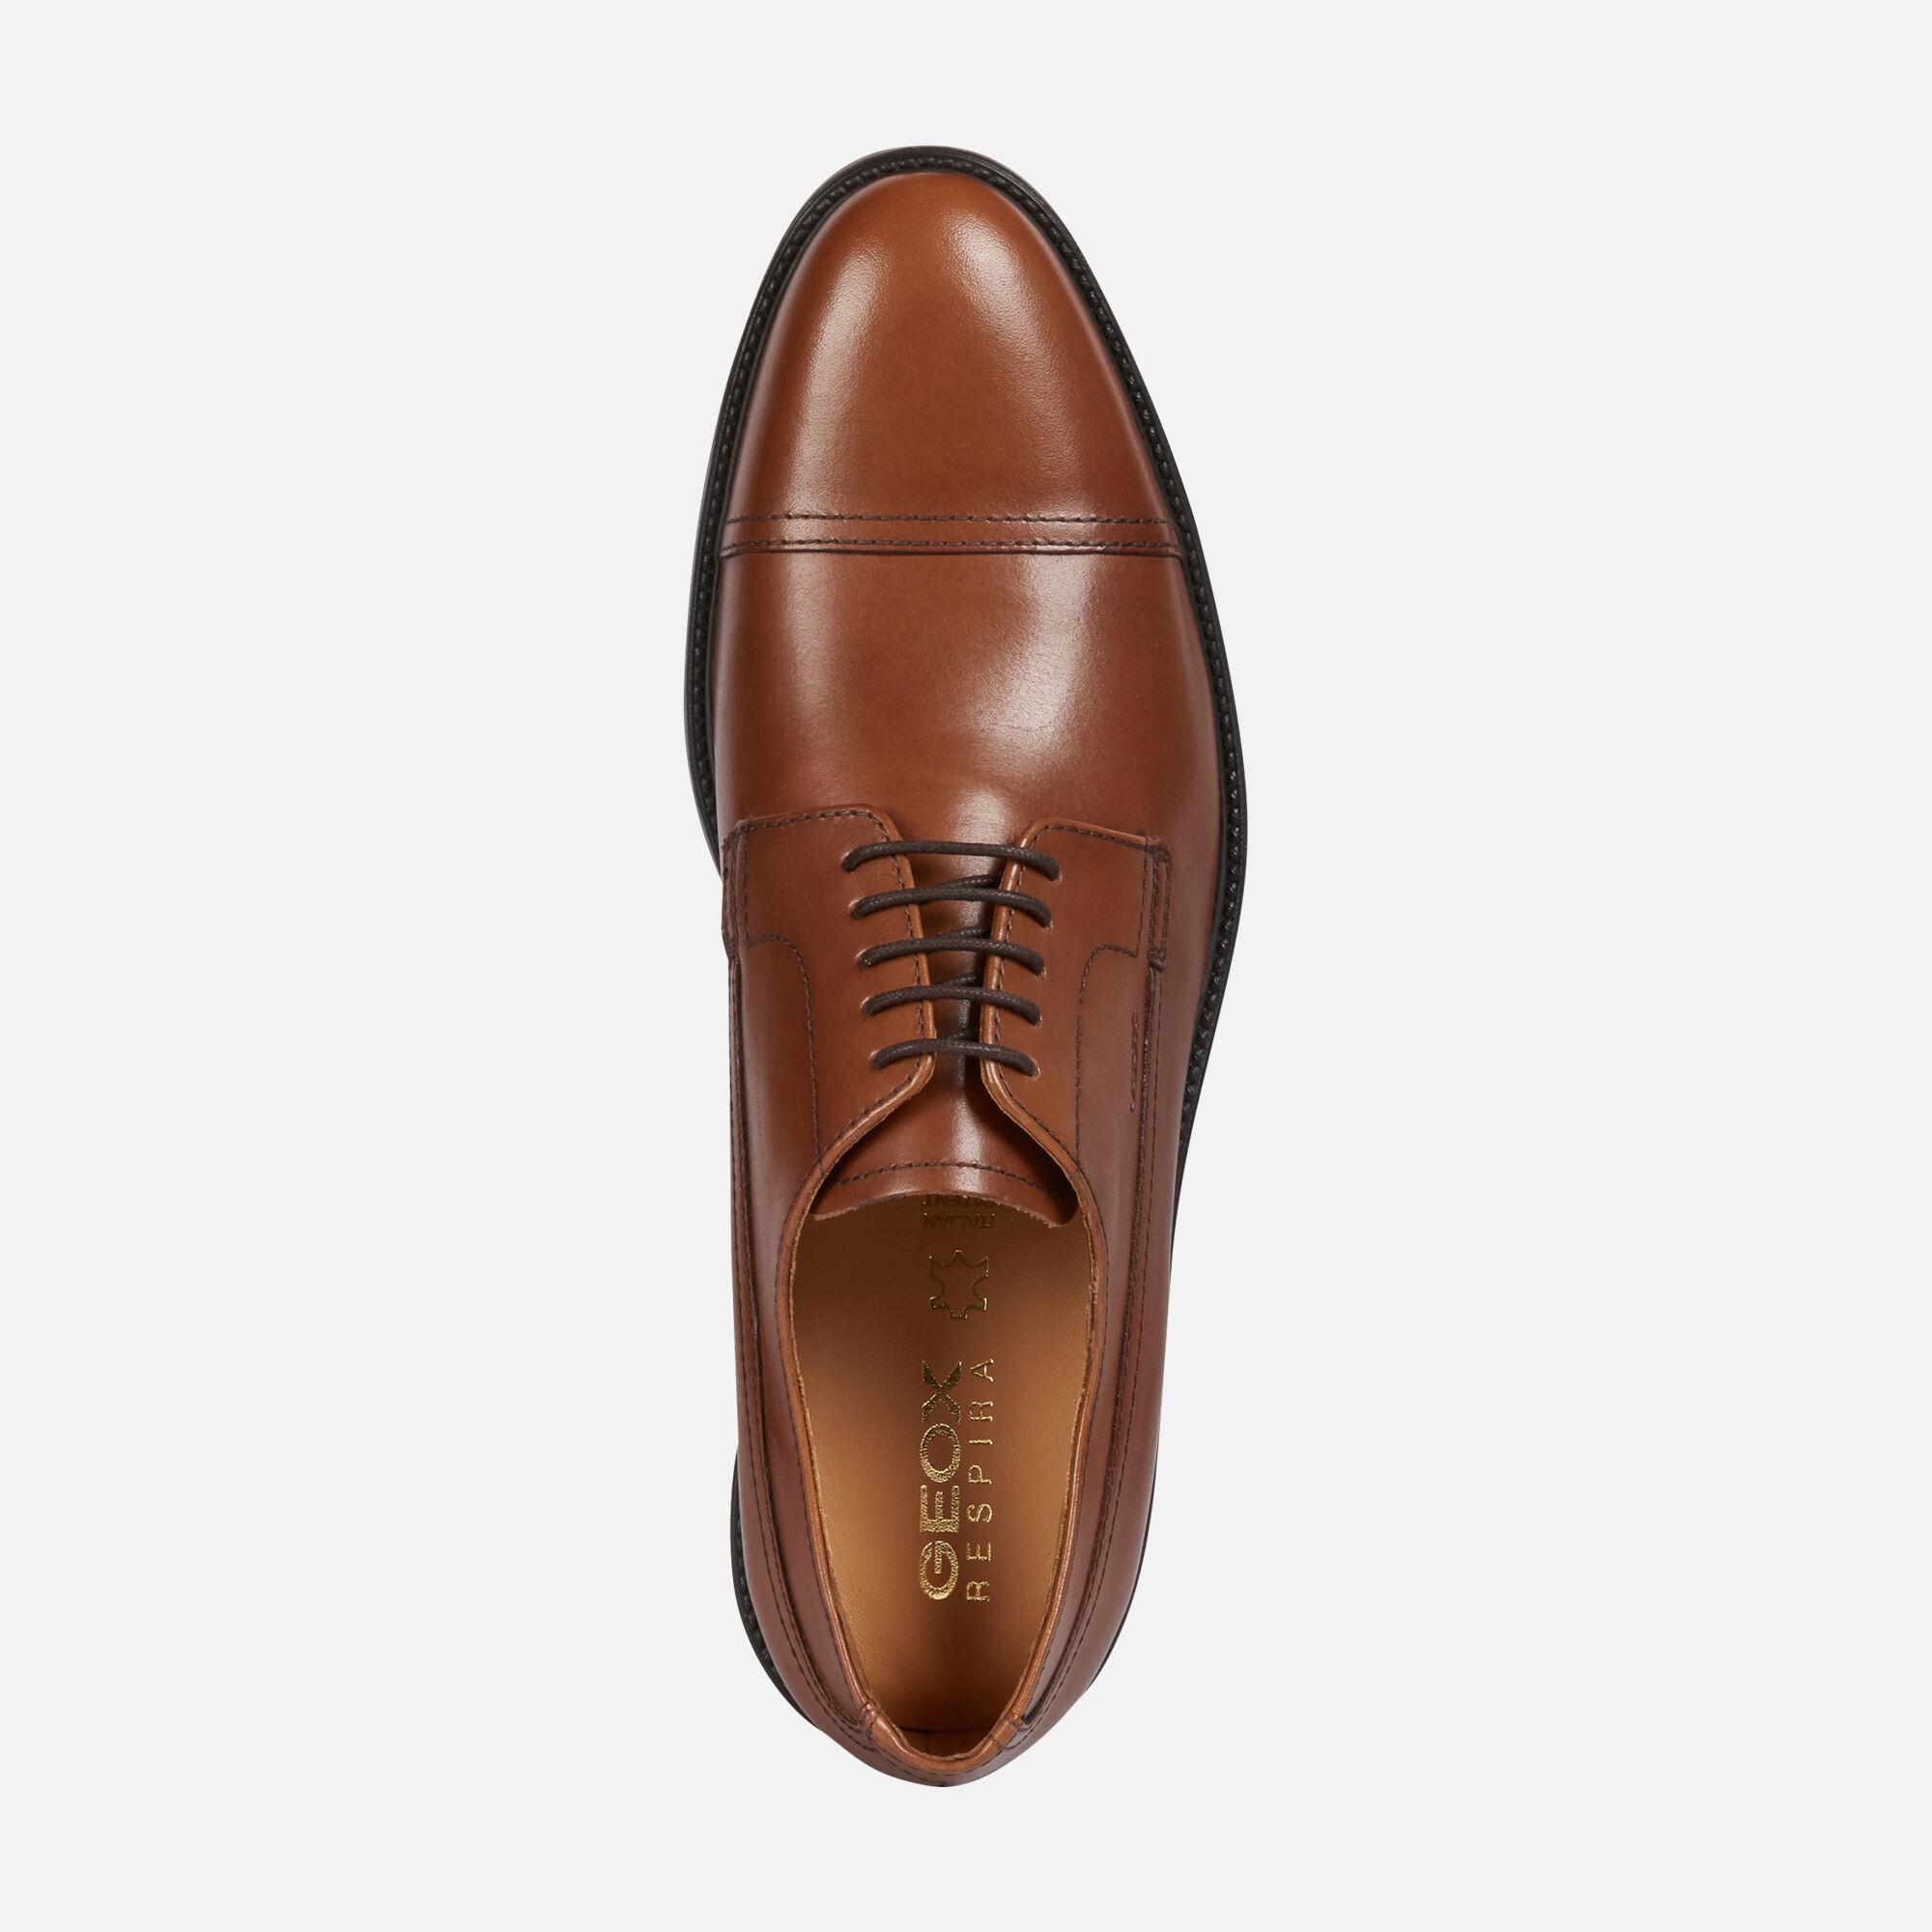 Geox CARNABY Uomo: Scarpe Eleganti Marroni cotto | Geox ®